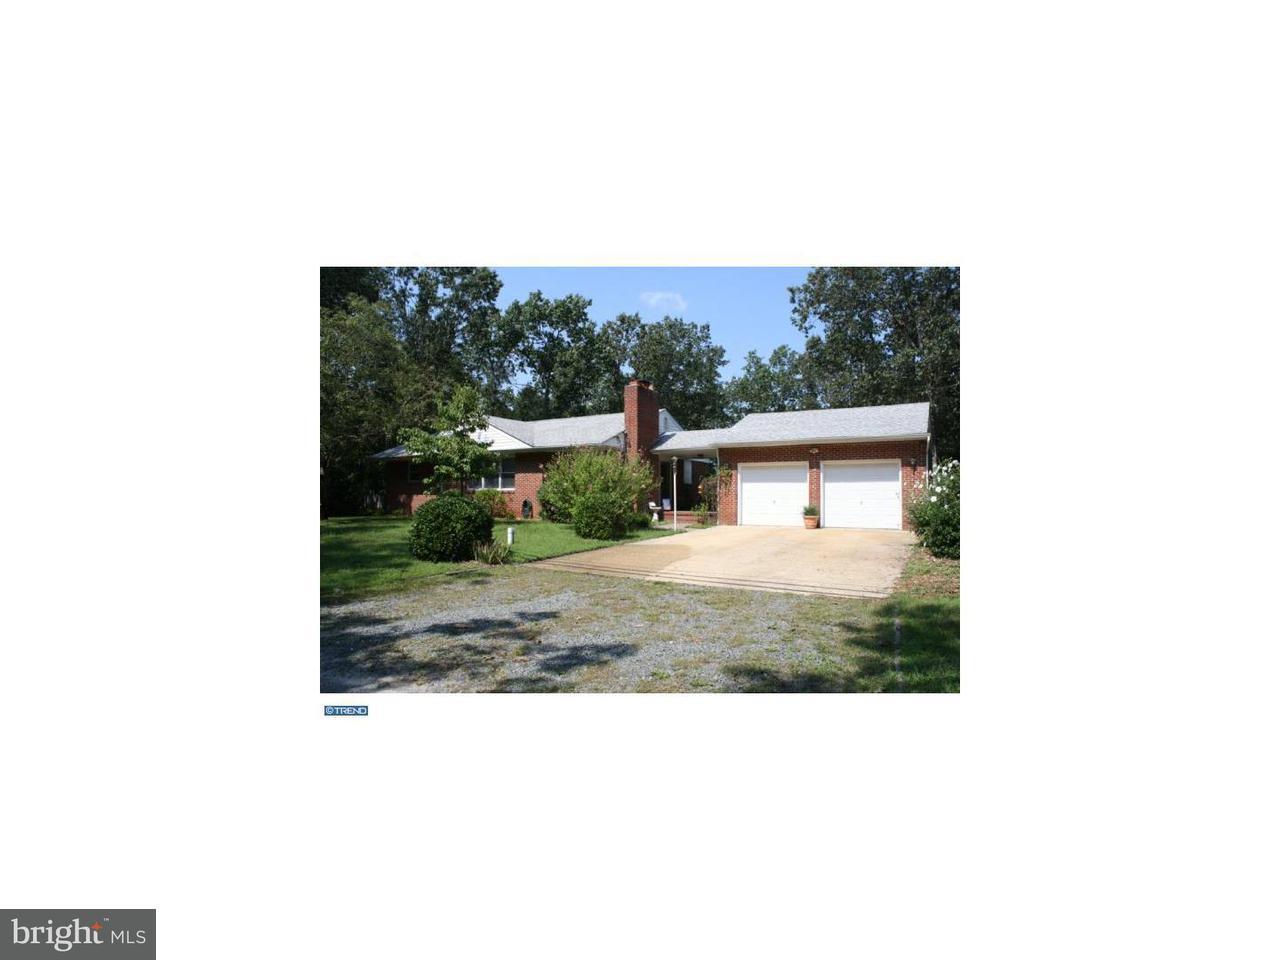 独户住宅 为 出租 在 125 WISCONSIN Trail Browns Mills, 新泽西州 08015 美国